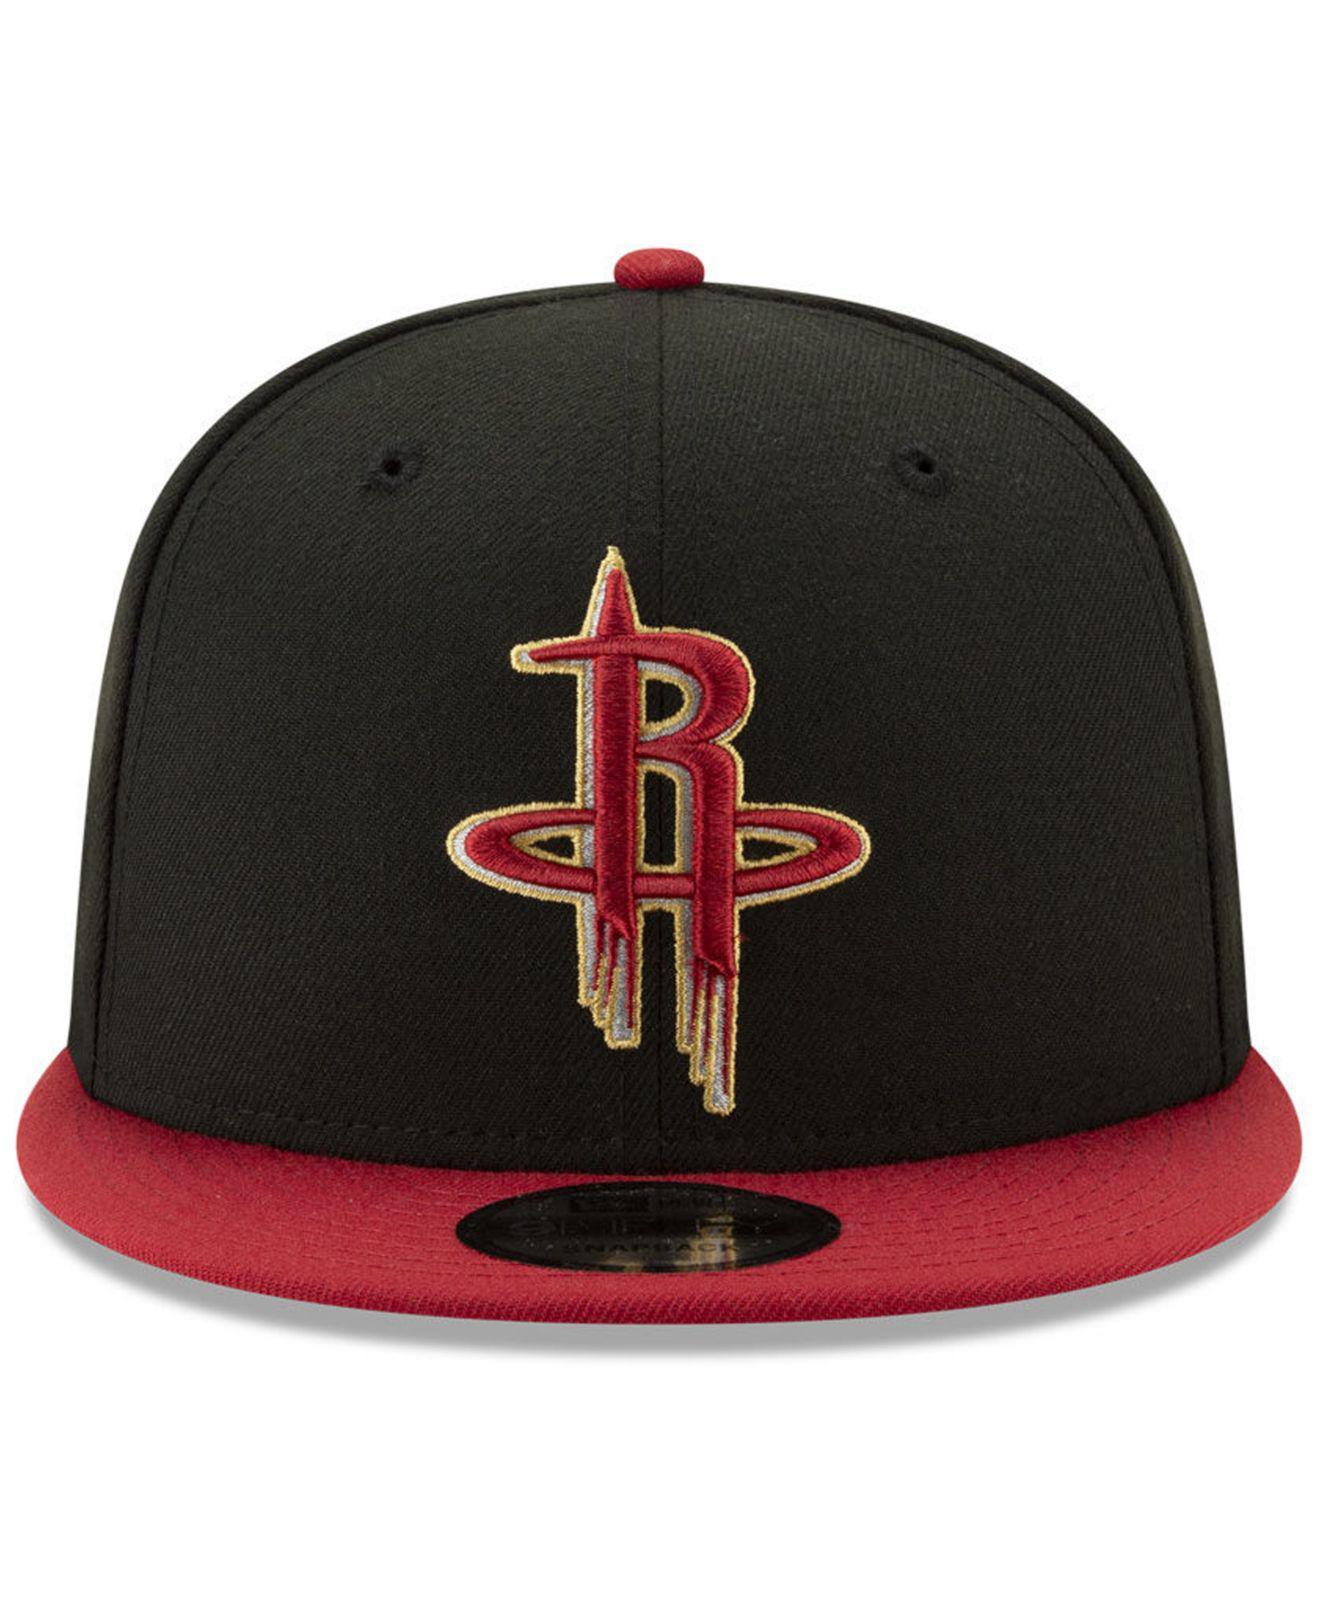 cheap for discount 6e2c3 17c15 Lyst - KTZ Houston Rockets City Pop Series 9fifty Snapback Cap in Black for  Men